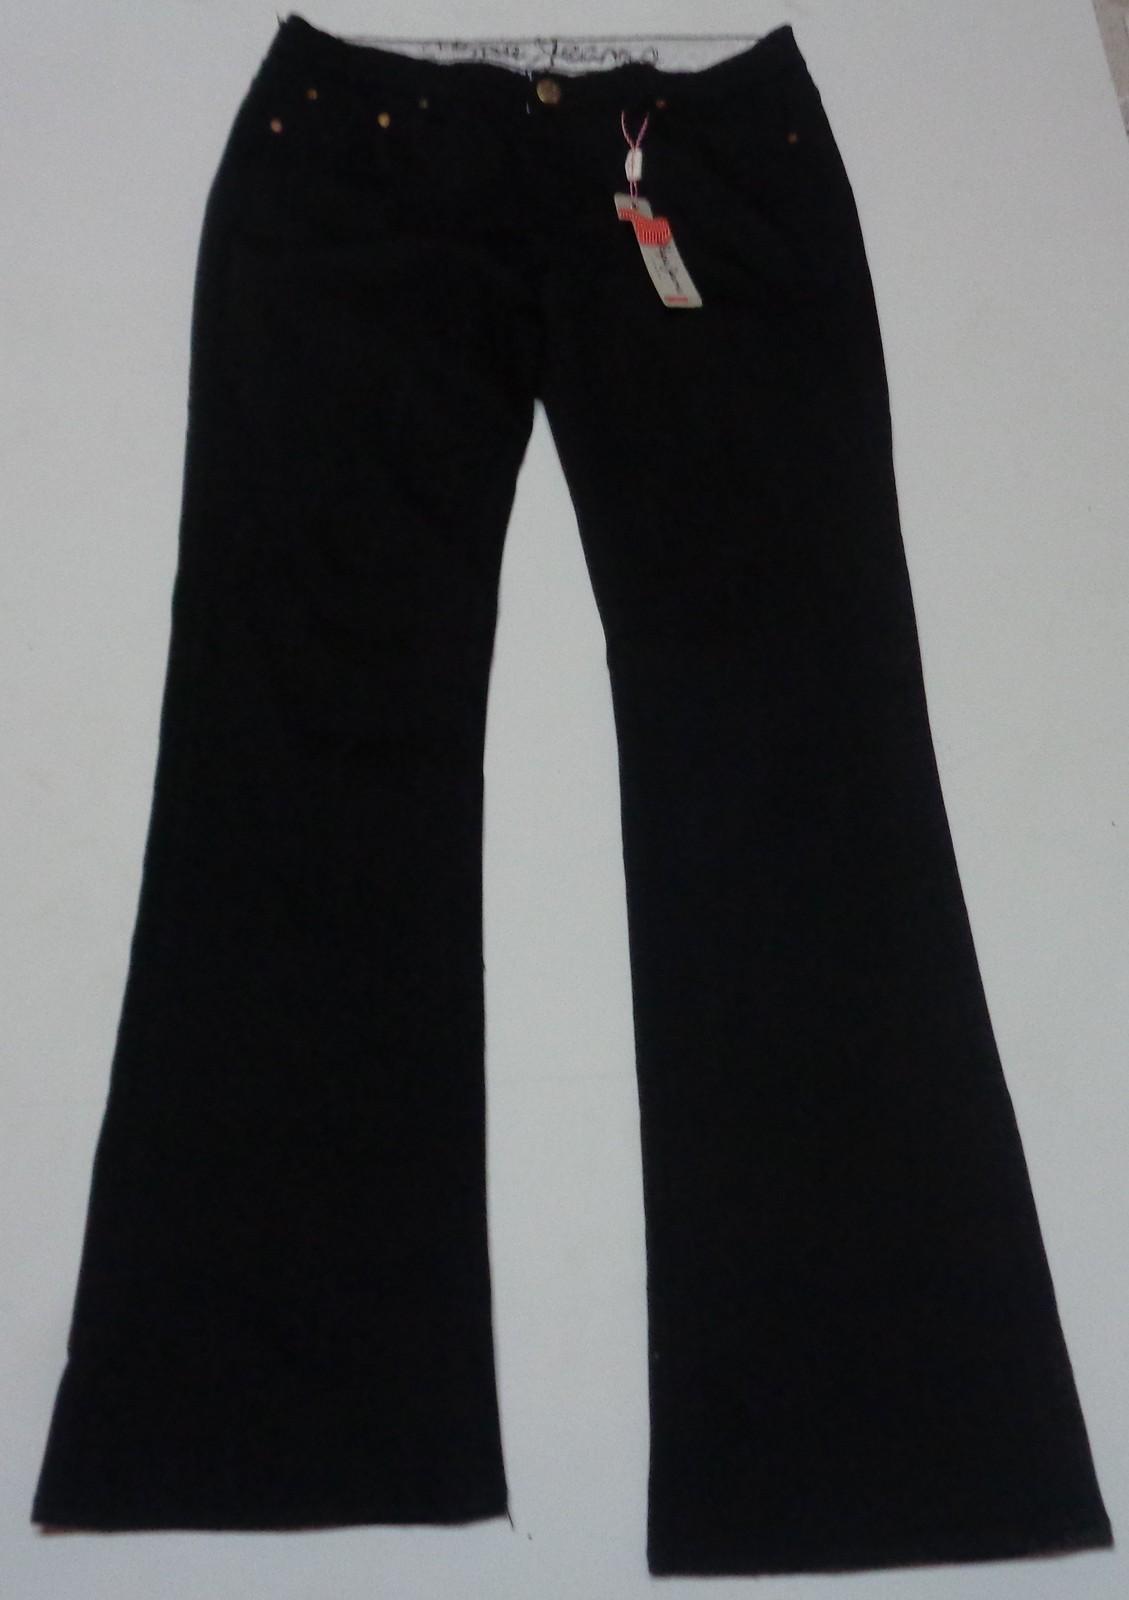 Pepe London Black Jeans NWT Size 31